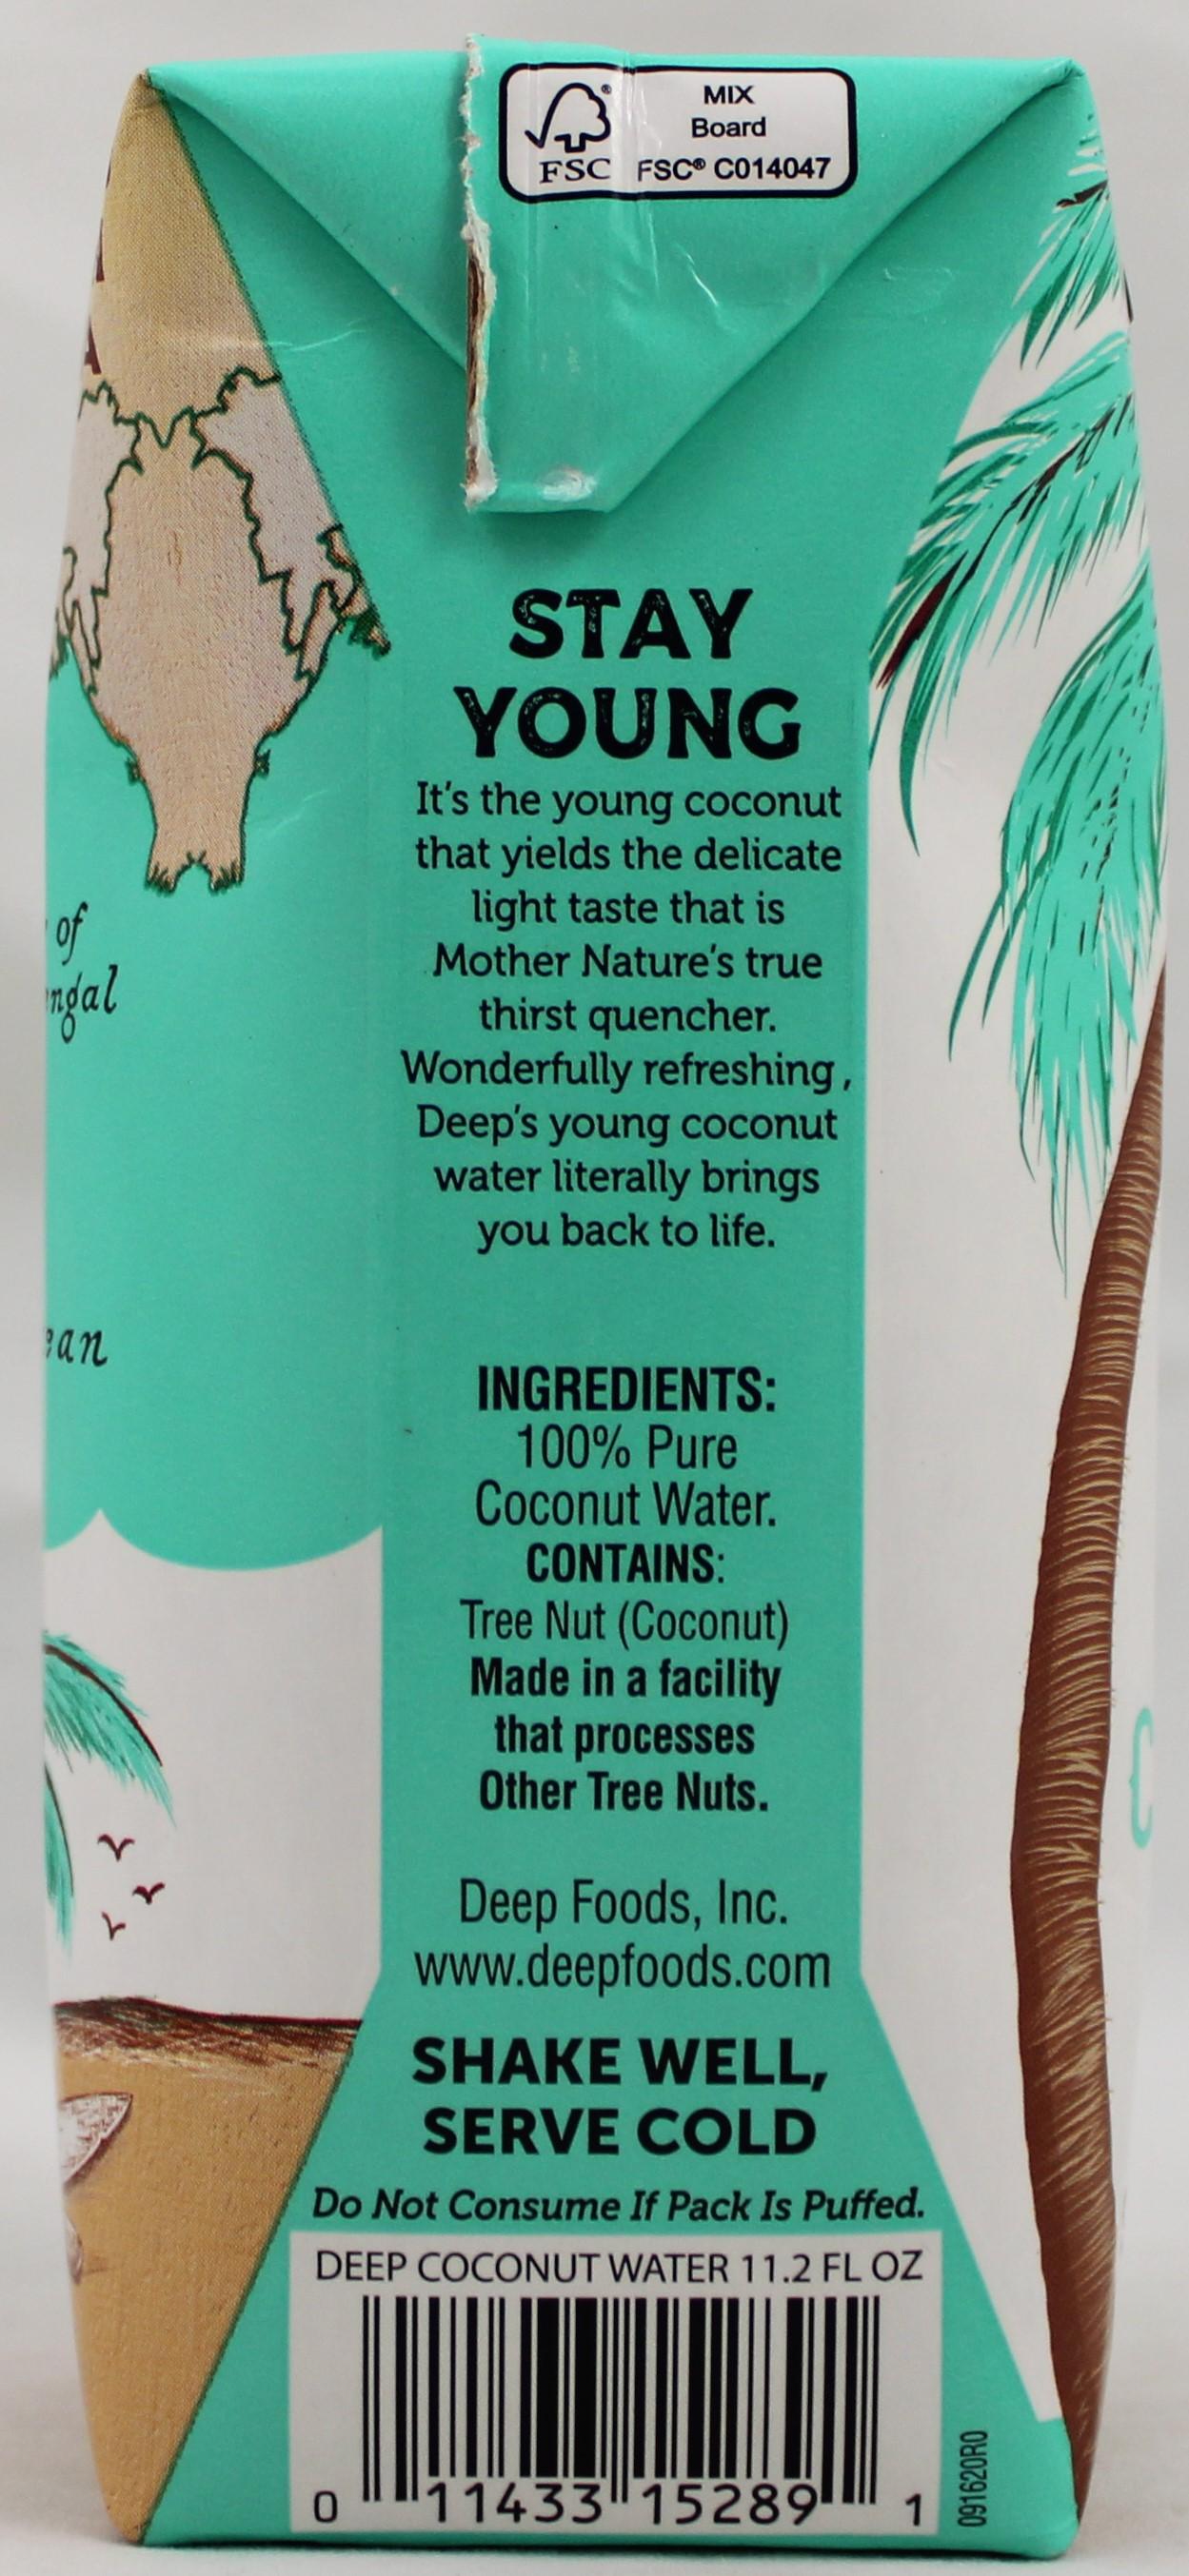 Coconut Water 11.2 fl oz